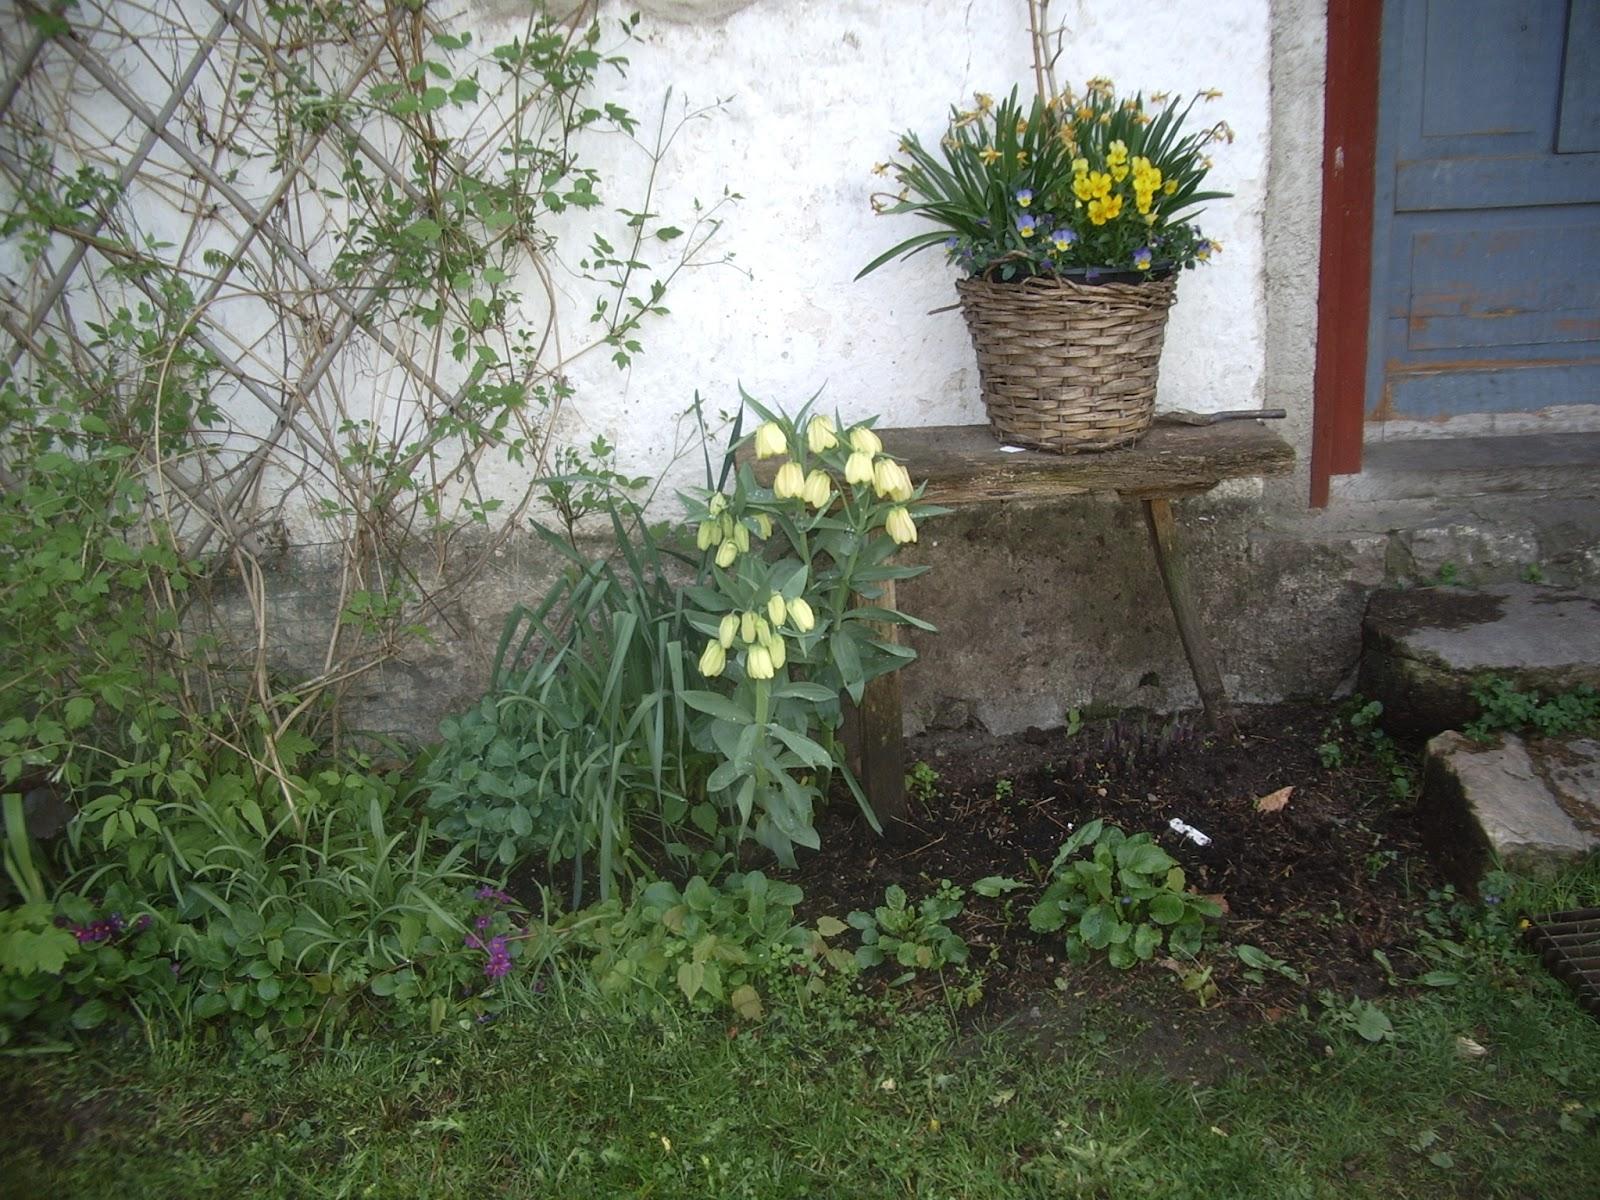 Mariehem i skåne: vårplanteringar